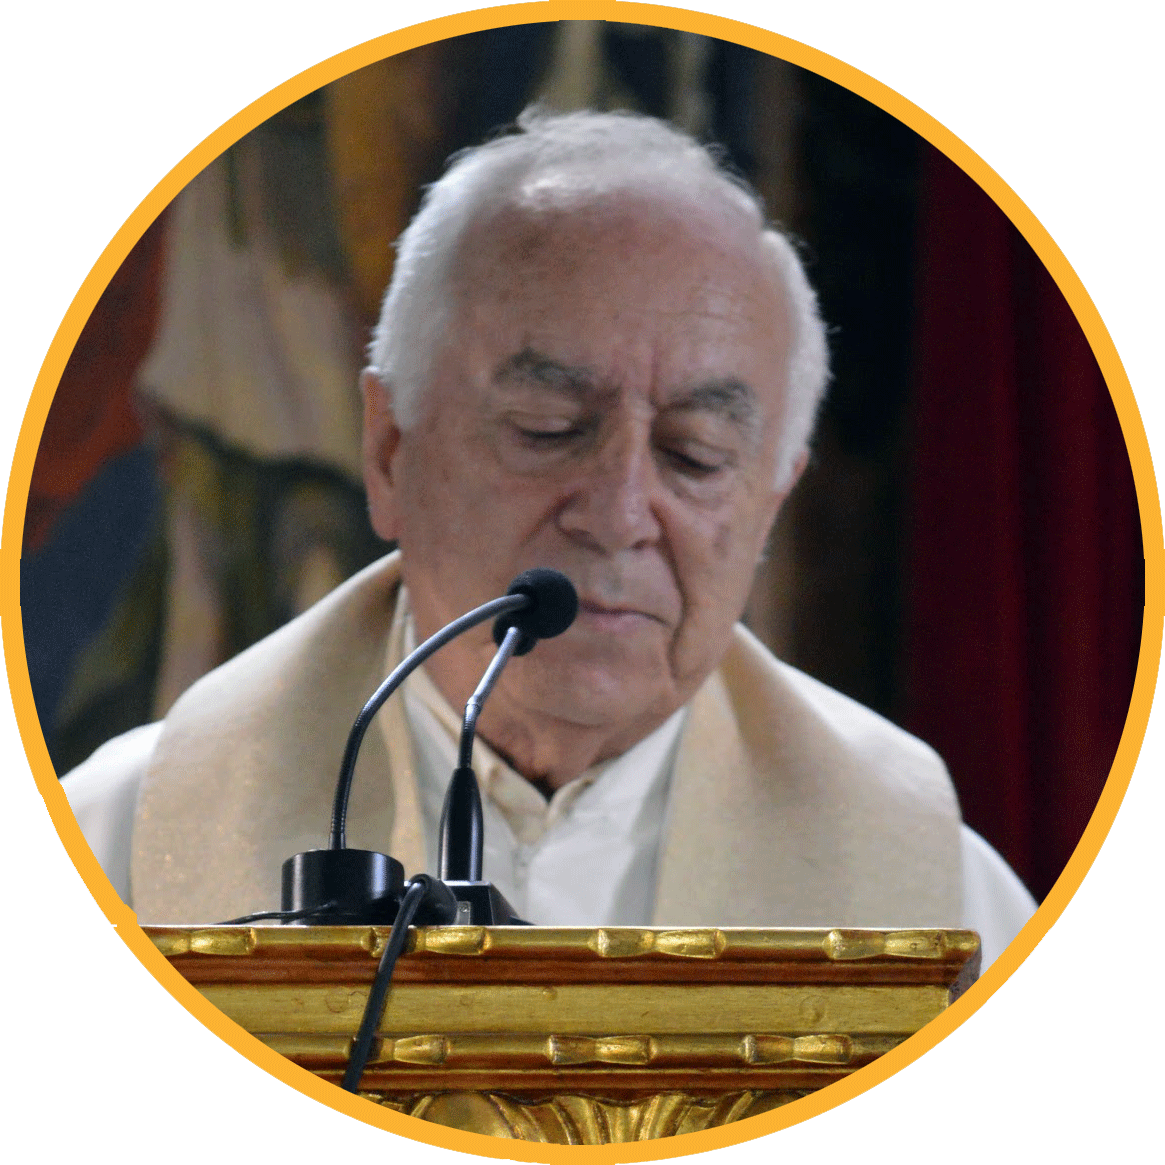 D. Luis Cornello Espina